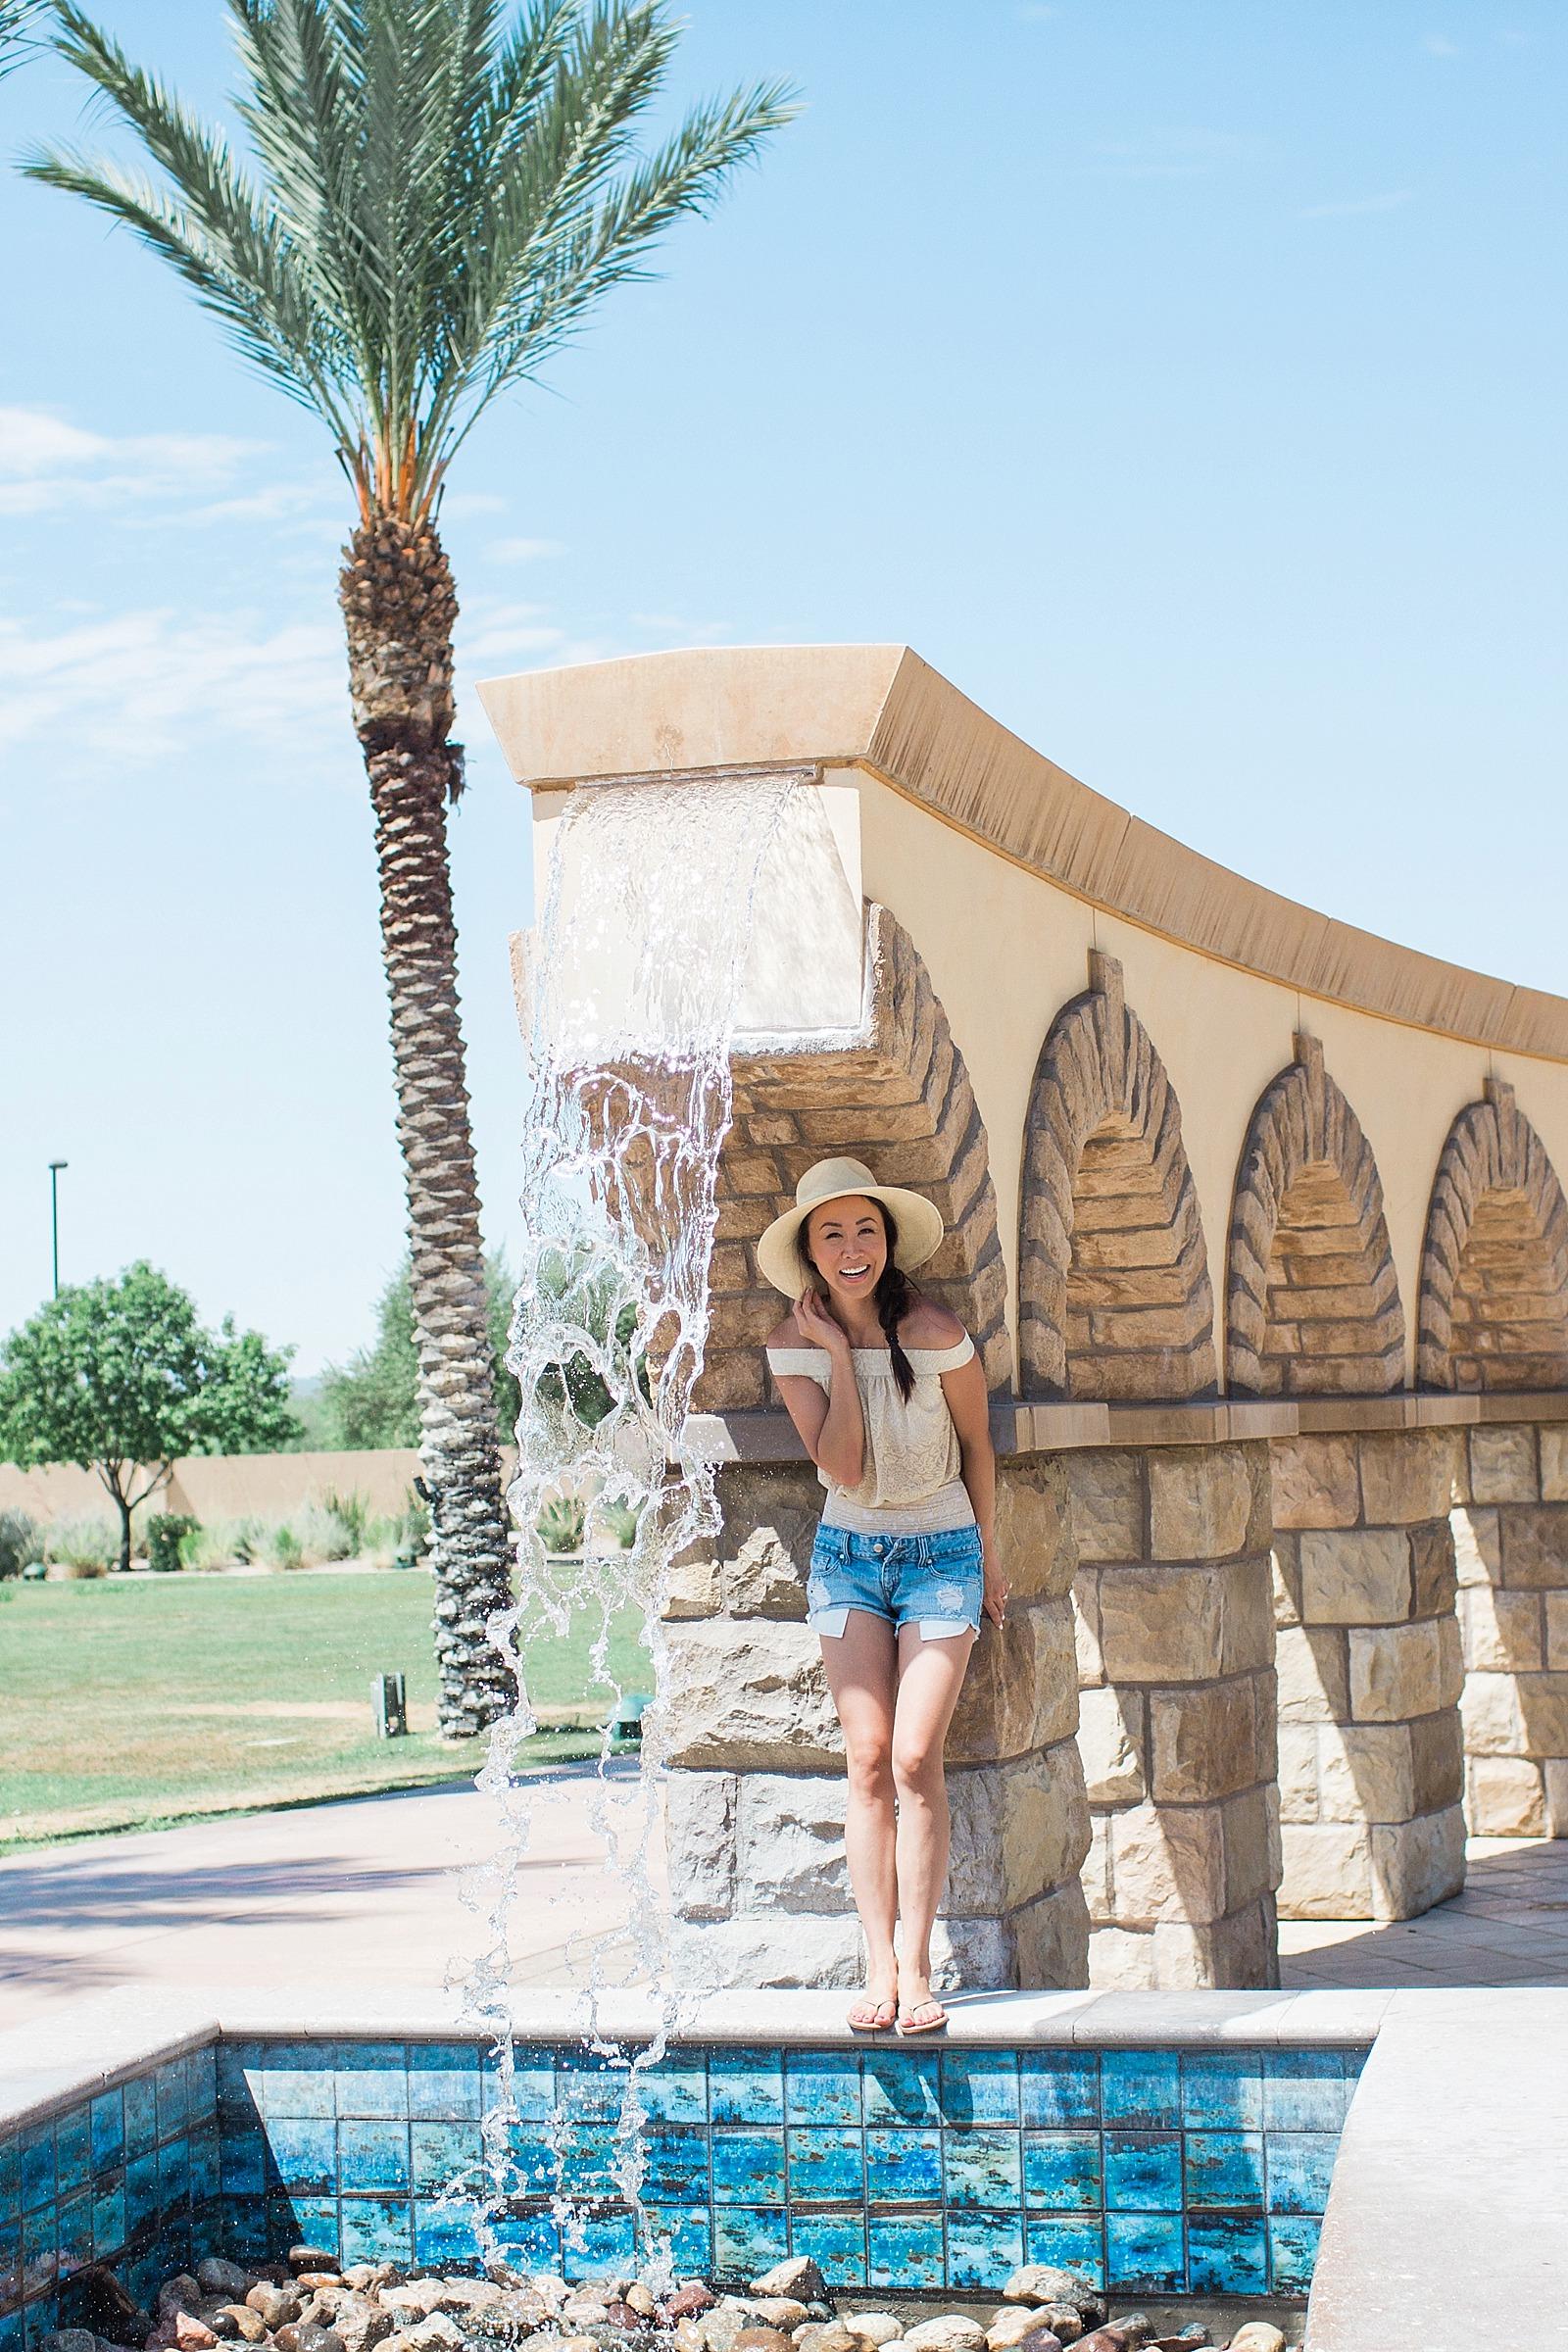 casino-del-sol-hotel-tucson-review-stay-diana-elizabeth-blog_0012